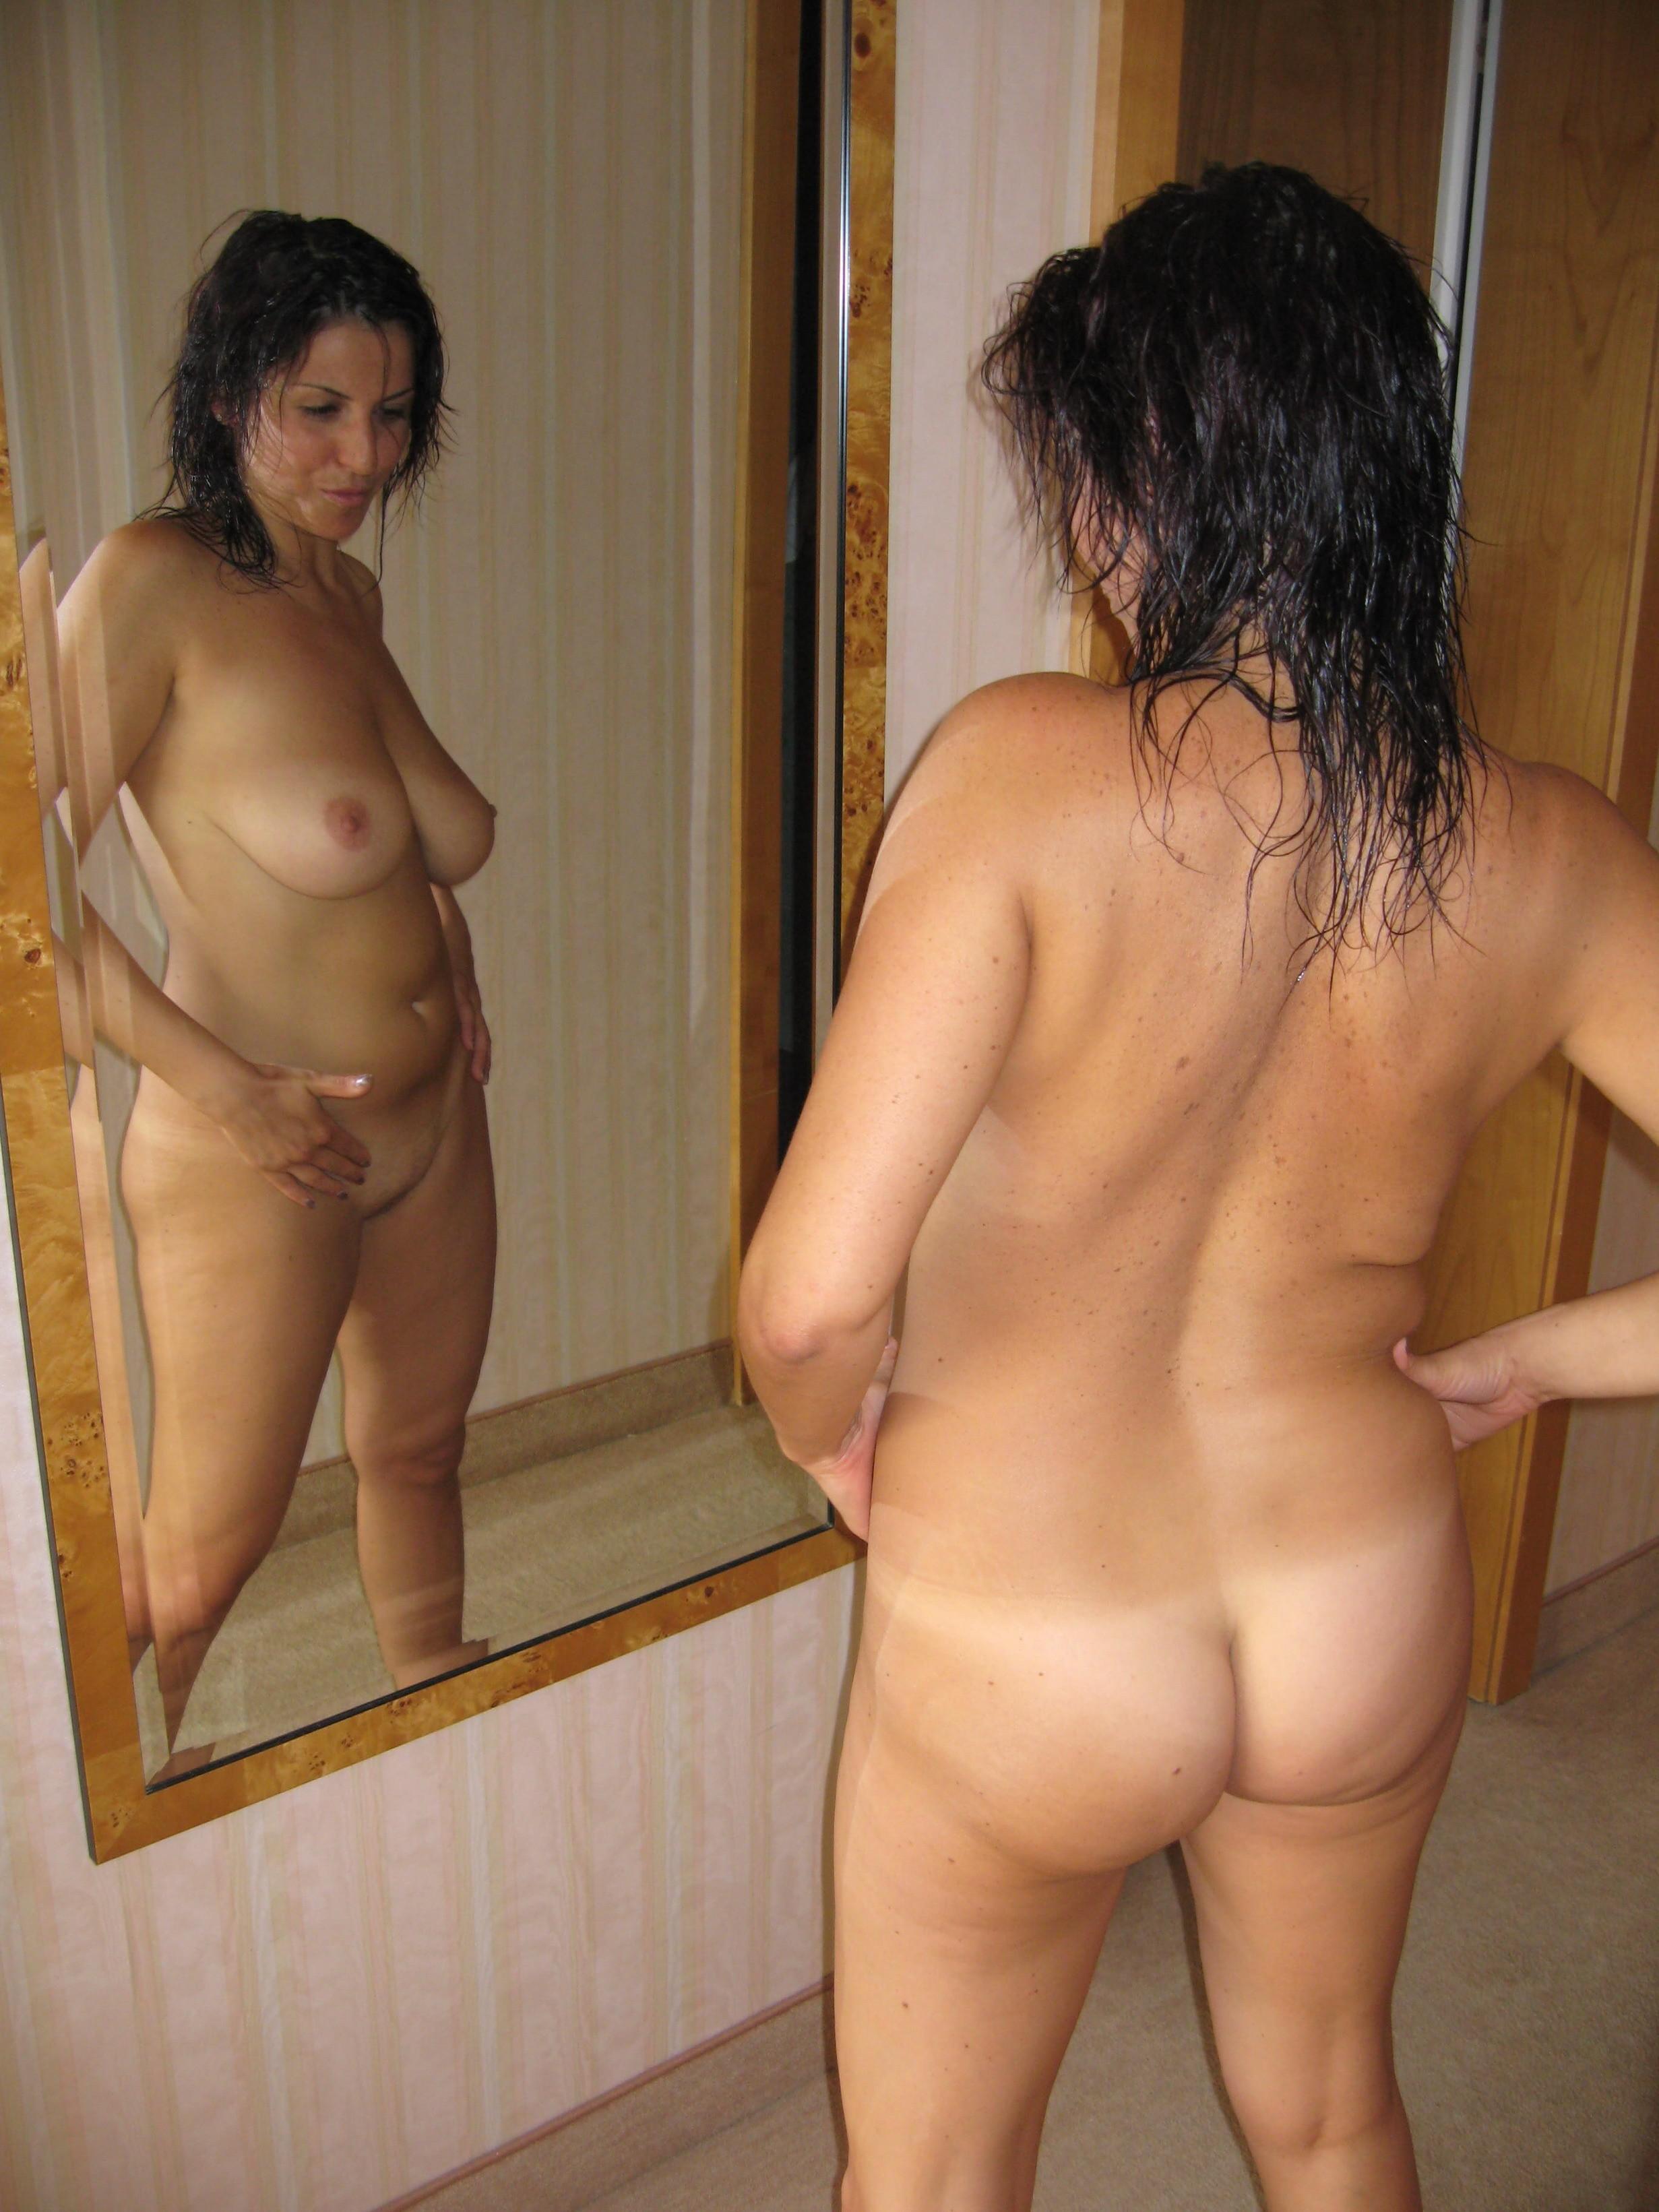 Киски разных возрастов порно фото — photo 11